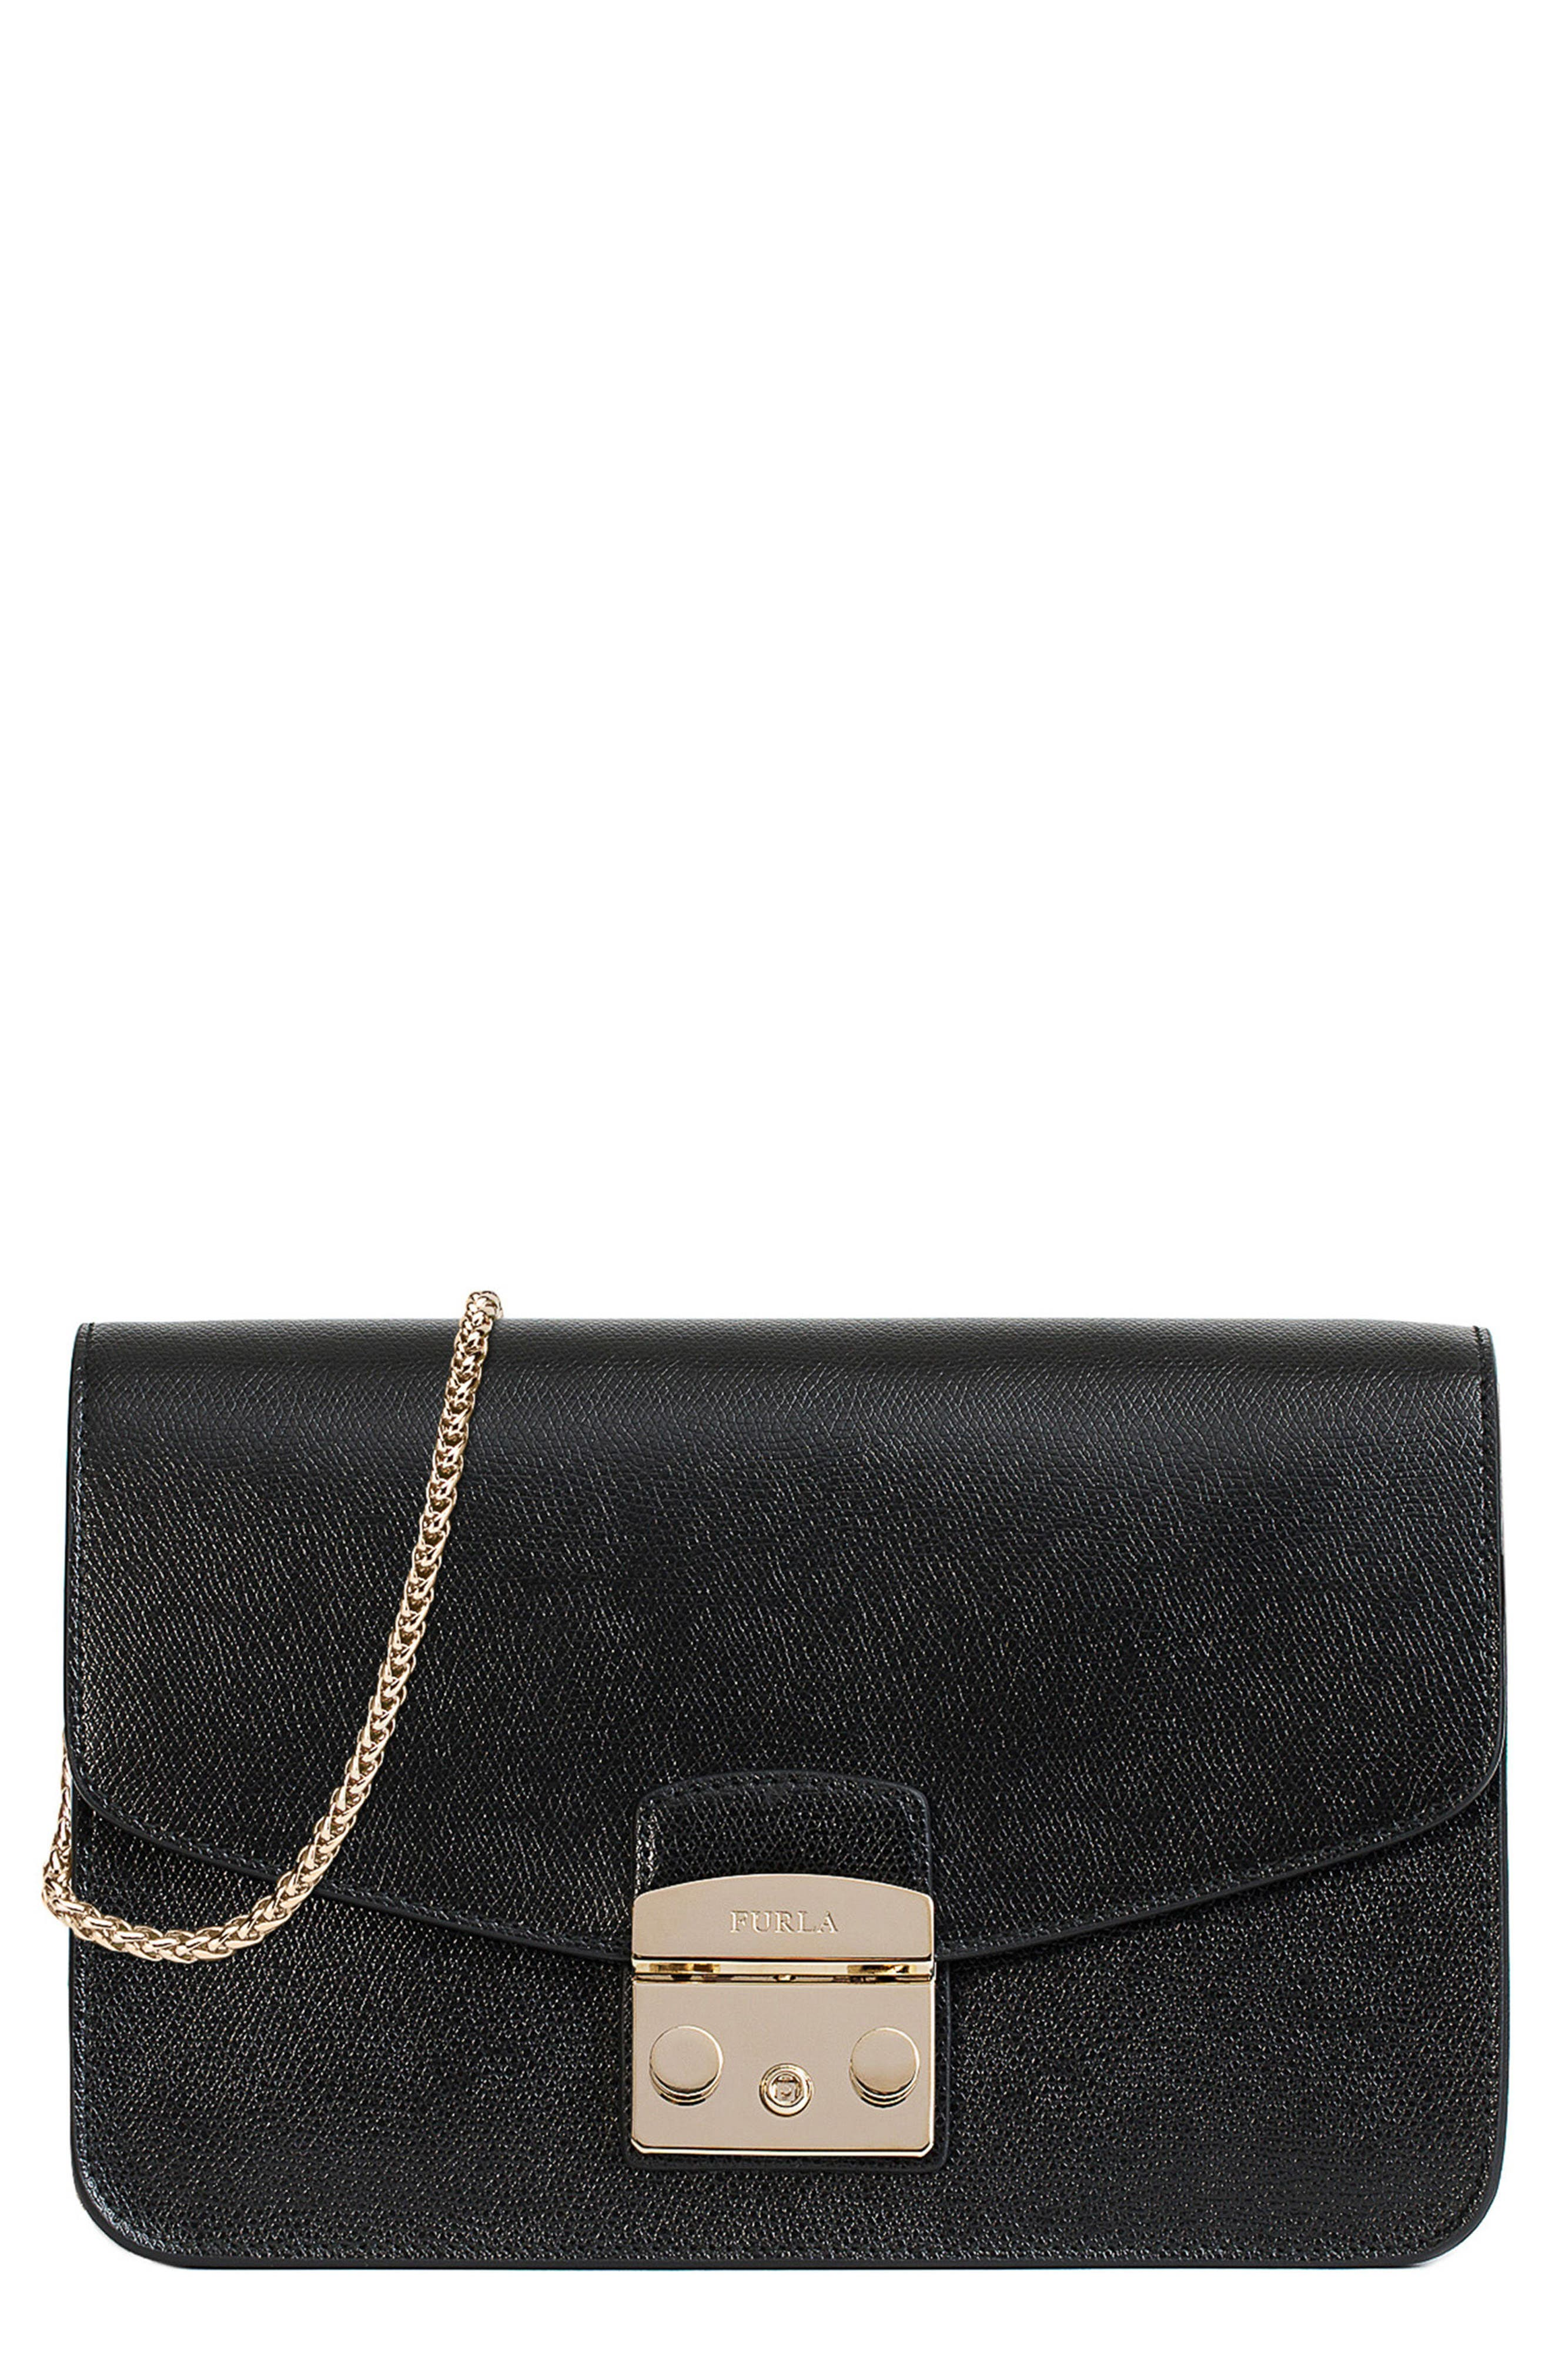 Small Metropolis Leather Crossbody Bag,                         Main,                         color, Onyx